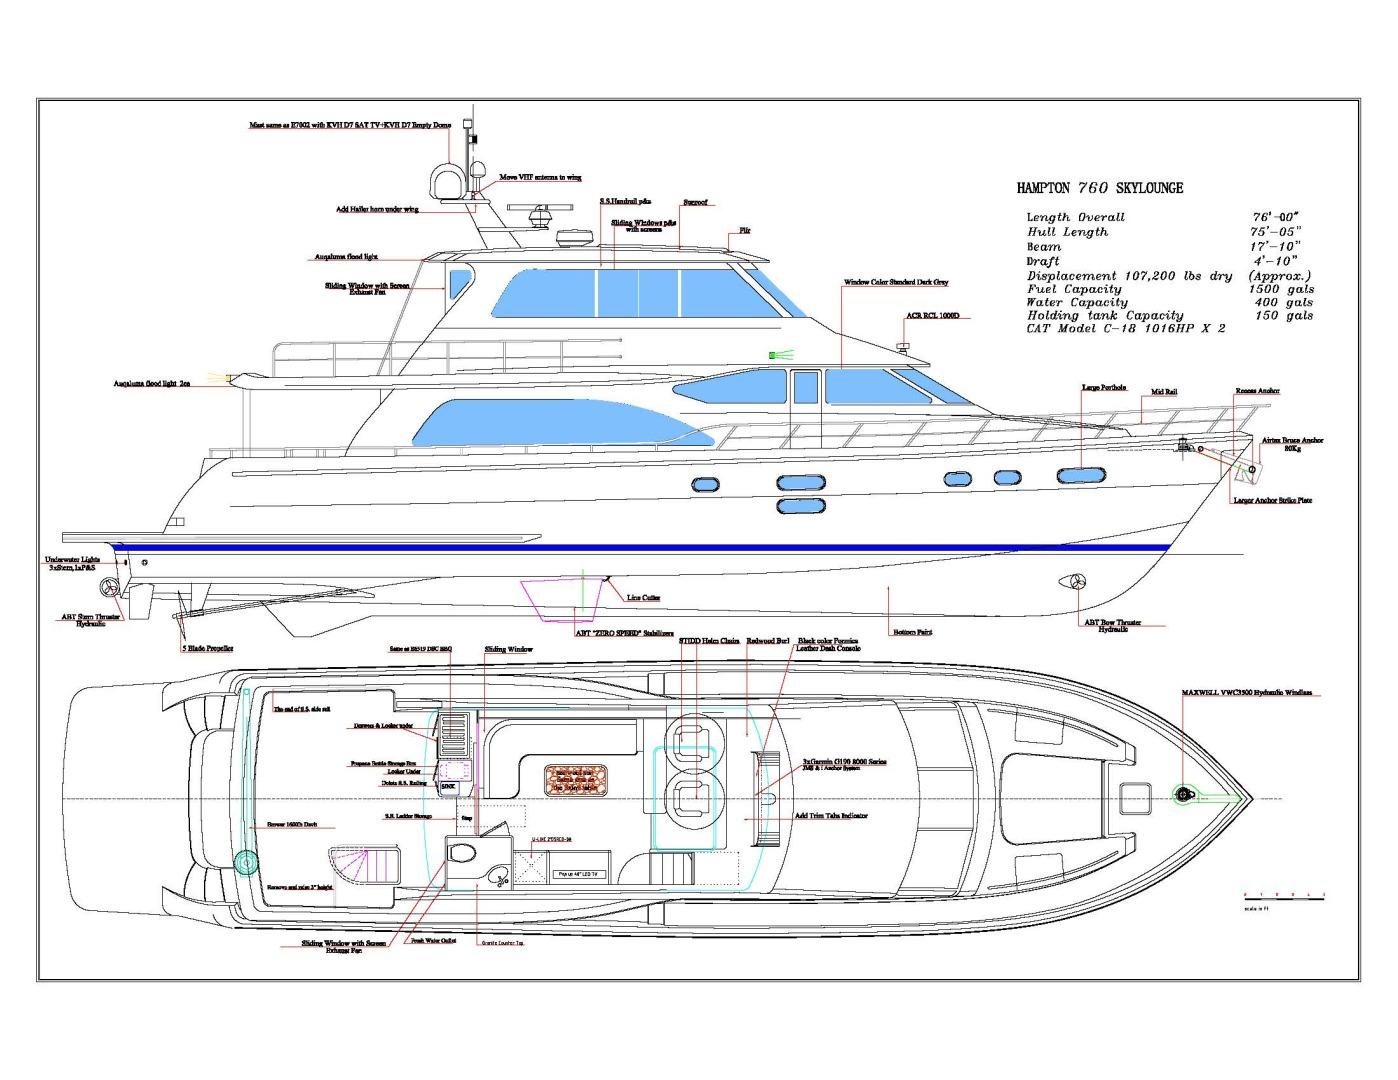 Hampton-76 Skylounge Motoryacht 2014-ODYSEA San Diego-California-United States-LAYOUT-1165965 | Thumbnail